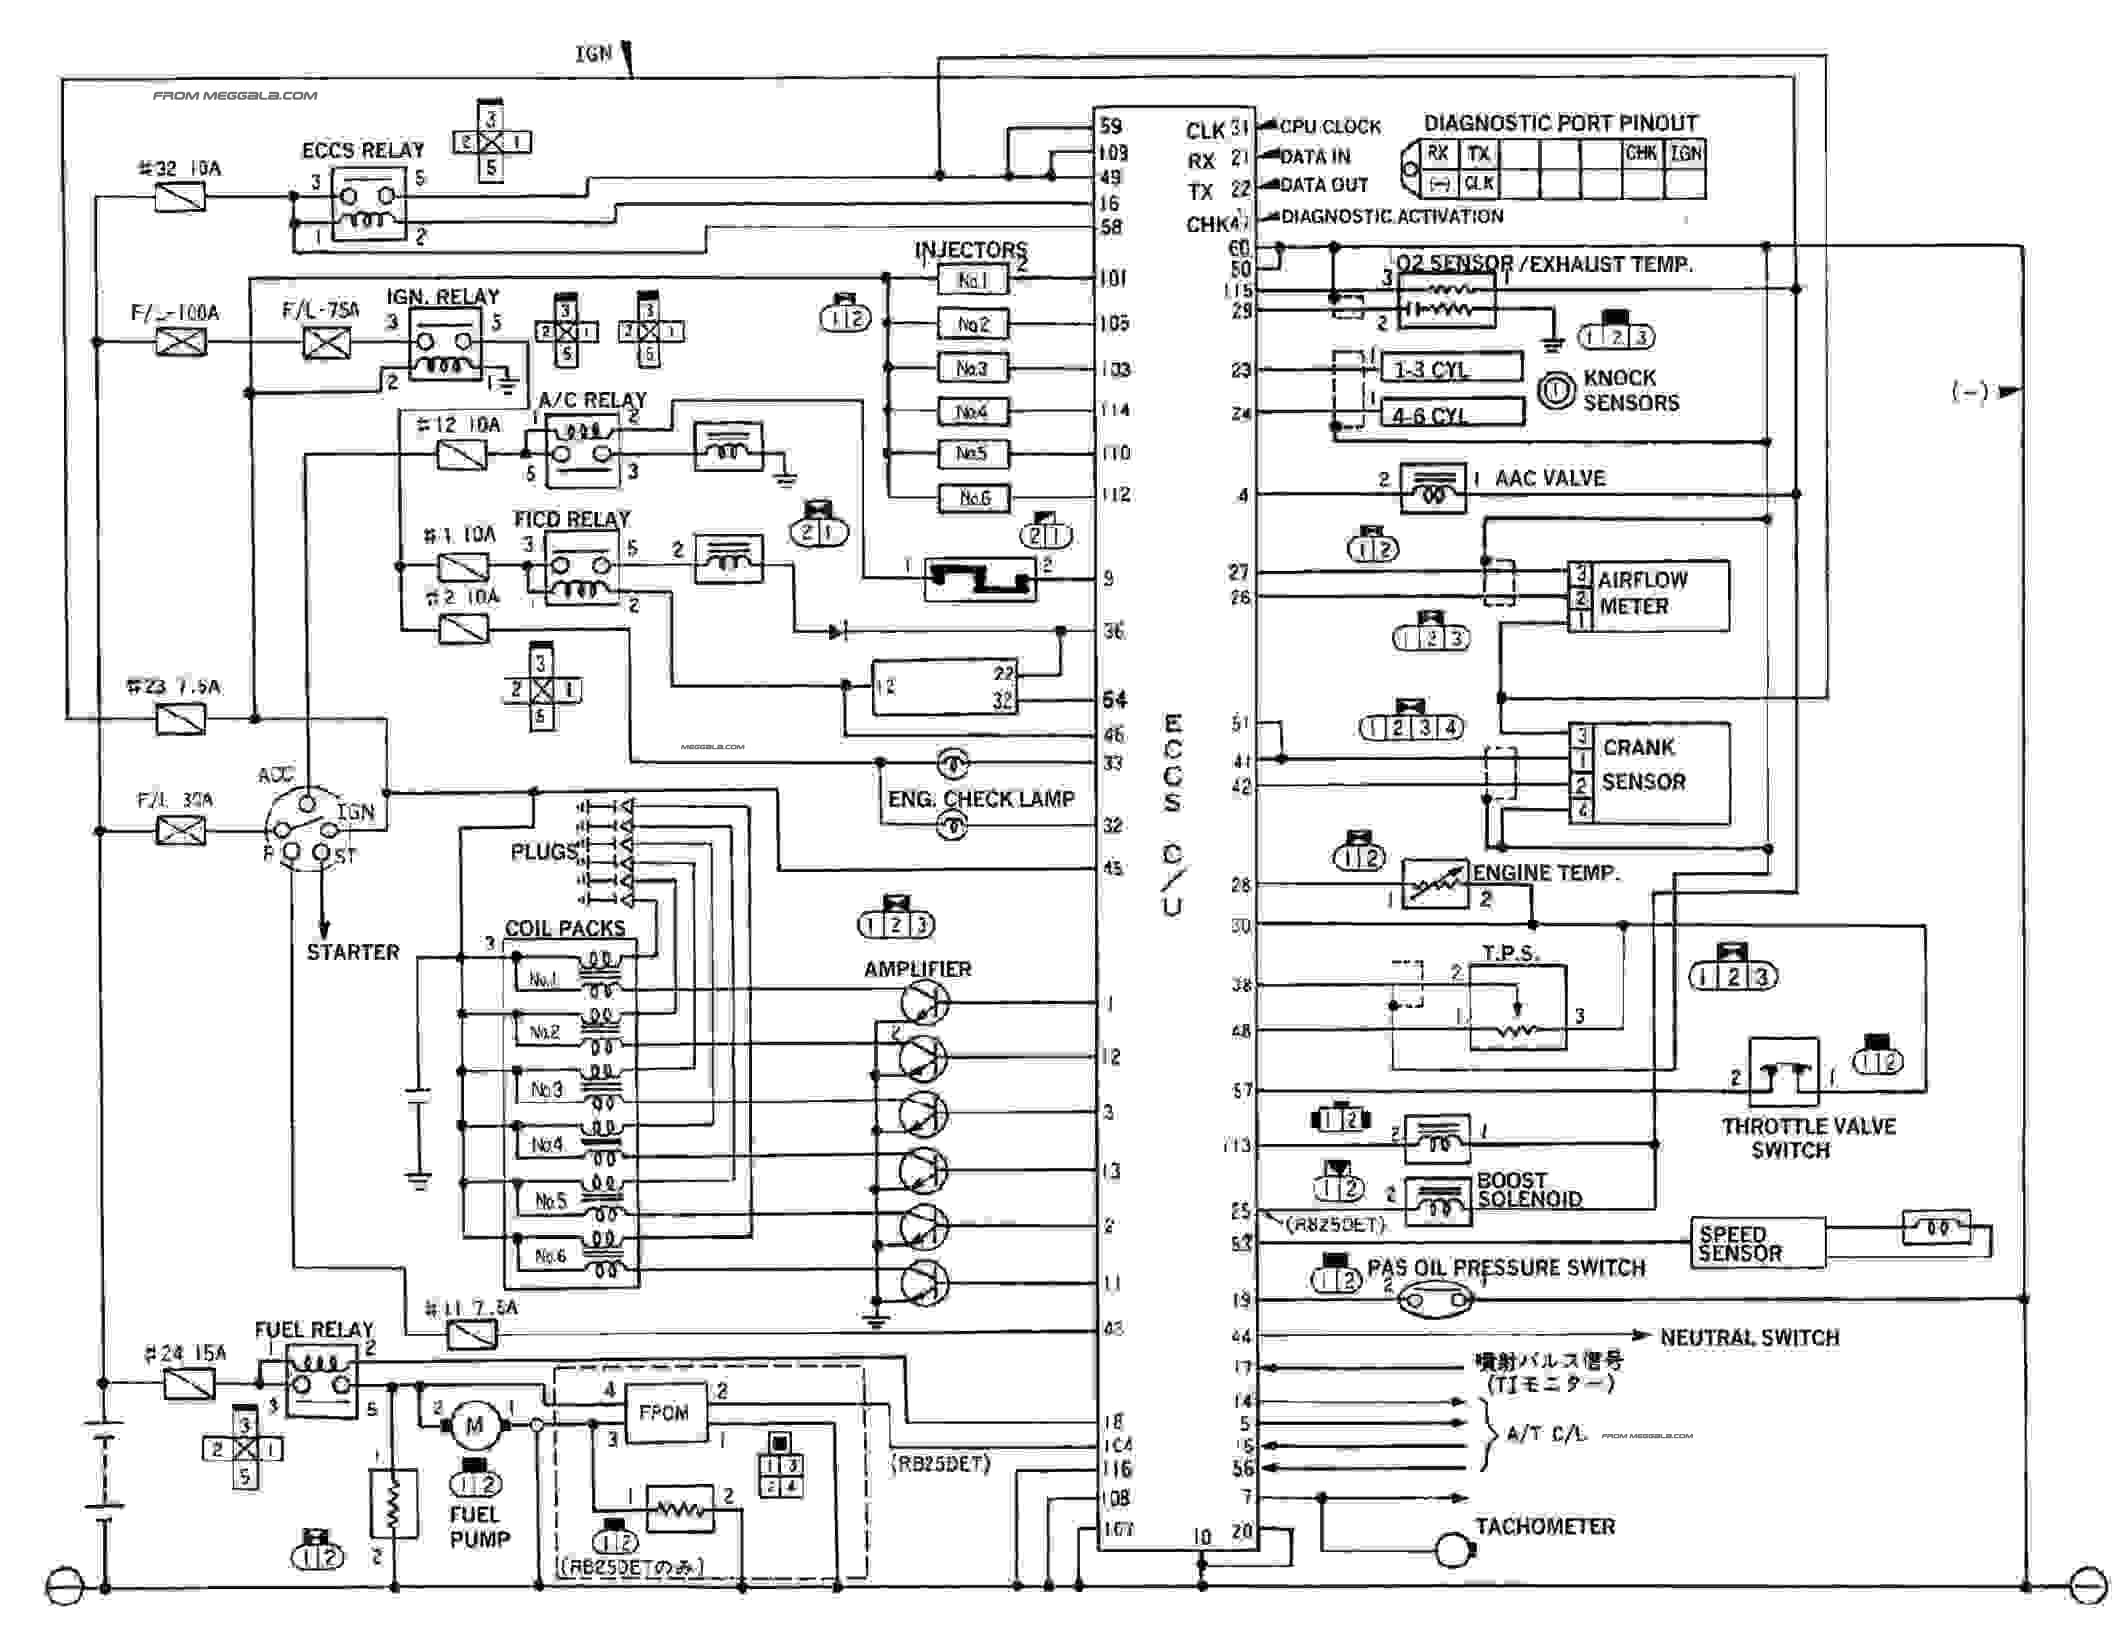 r32 engine diagram wiring diagram centre rb20det engine harness diagram rb20det engine diagram